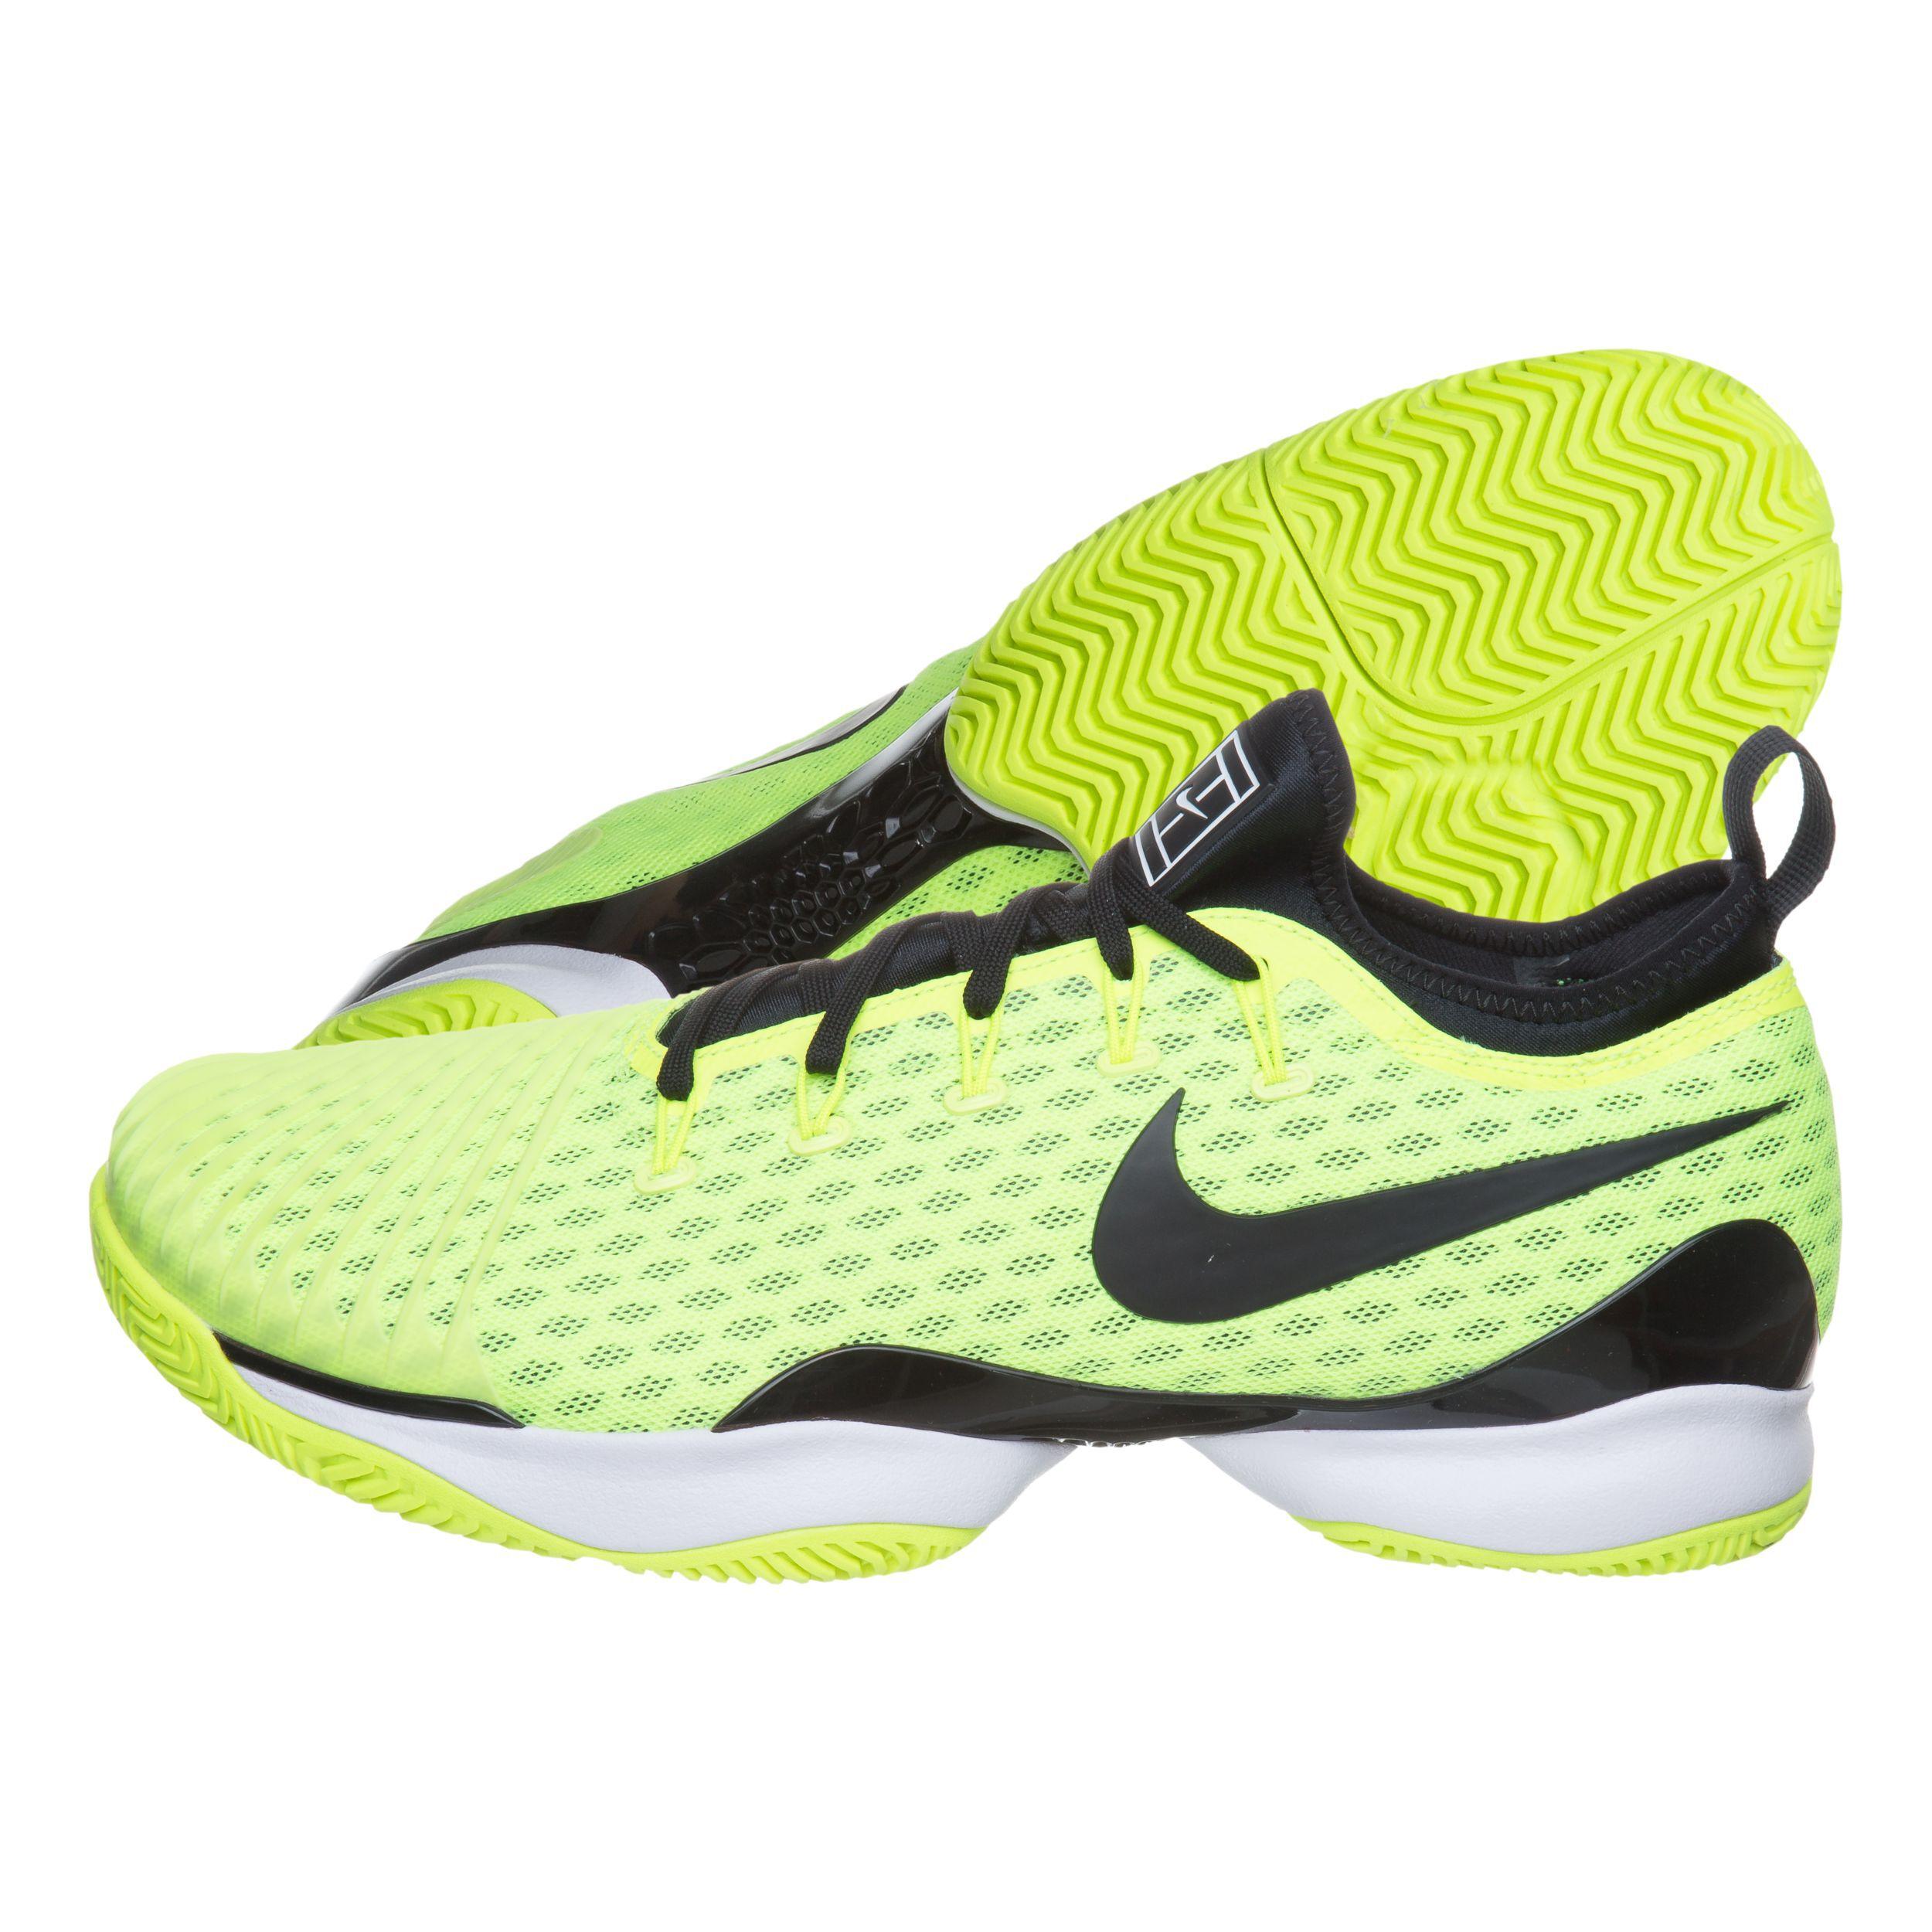 Nike Air Zoom Ultra React Allcourtschuh Exklusiv Herren